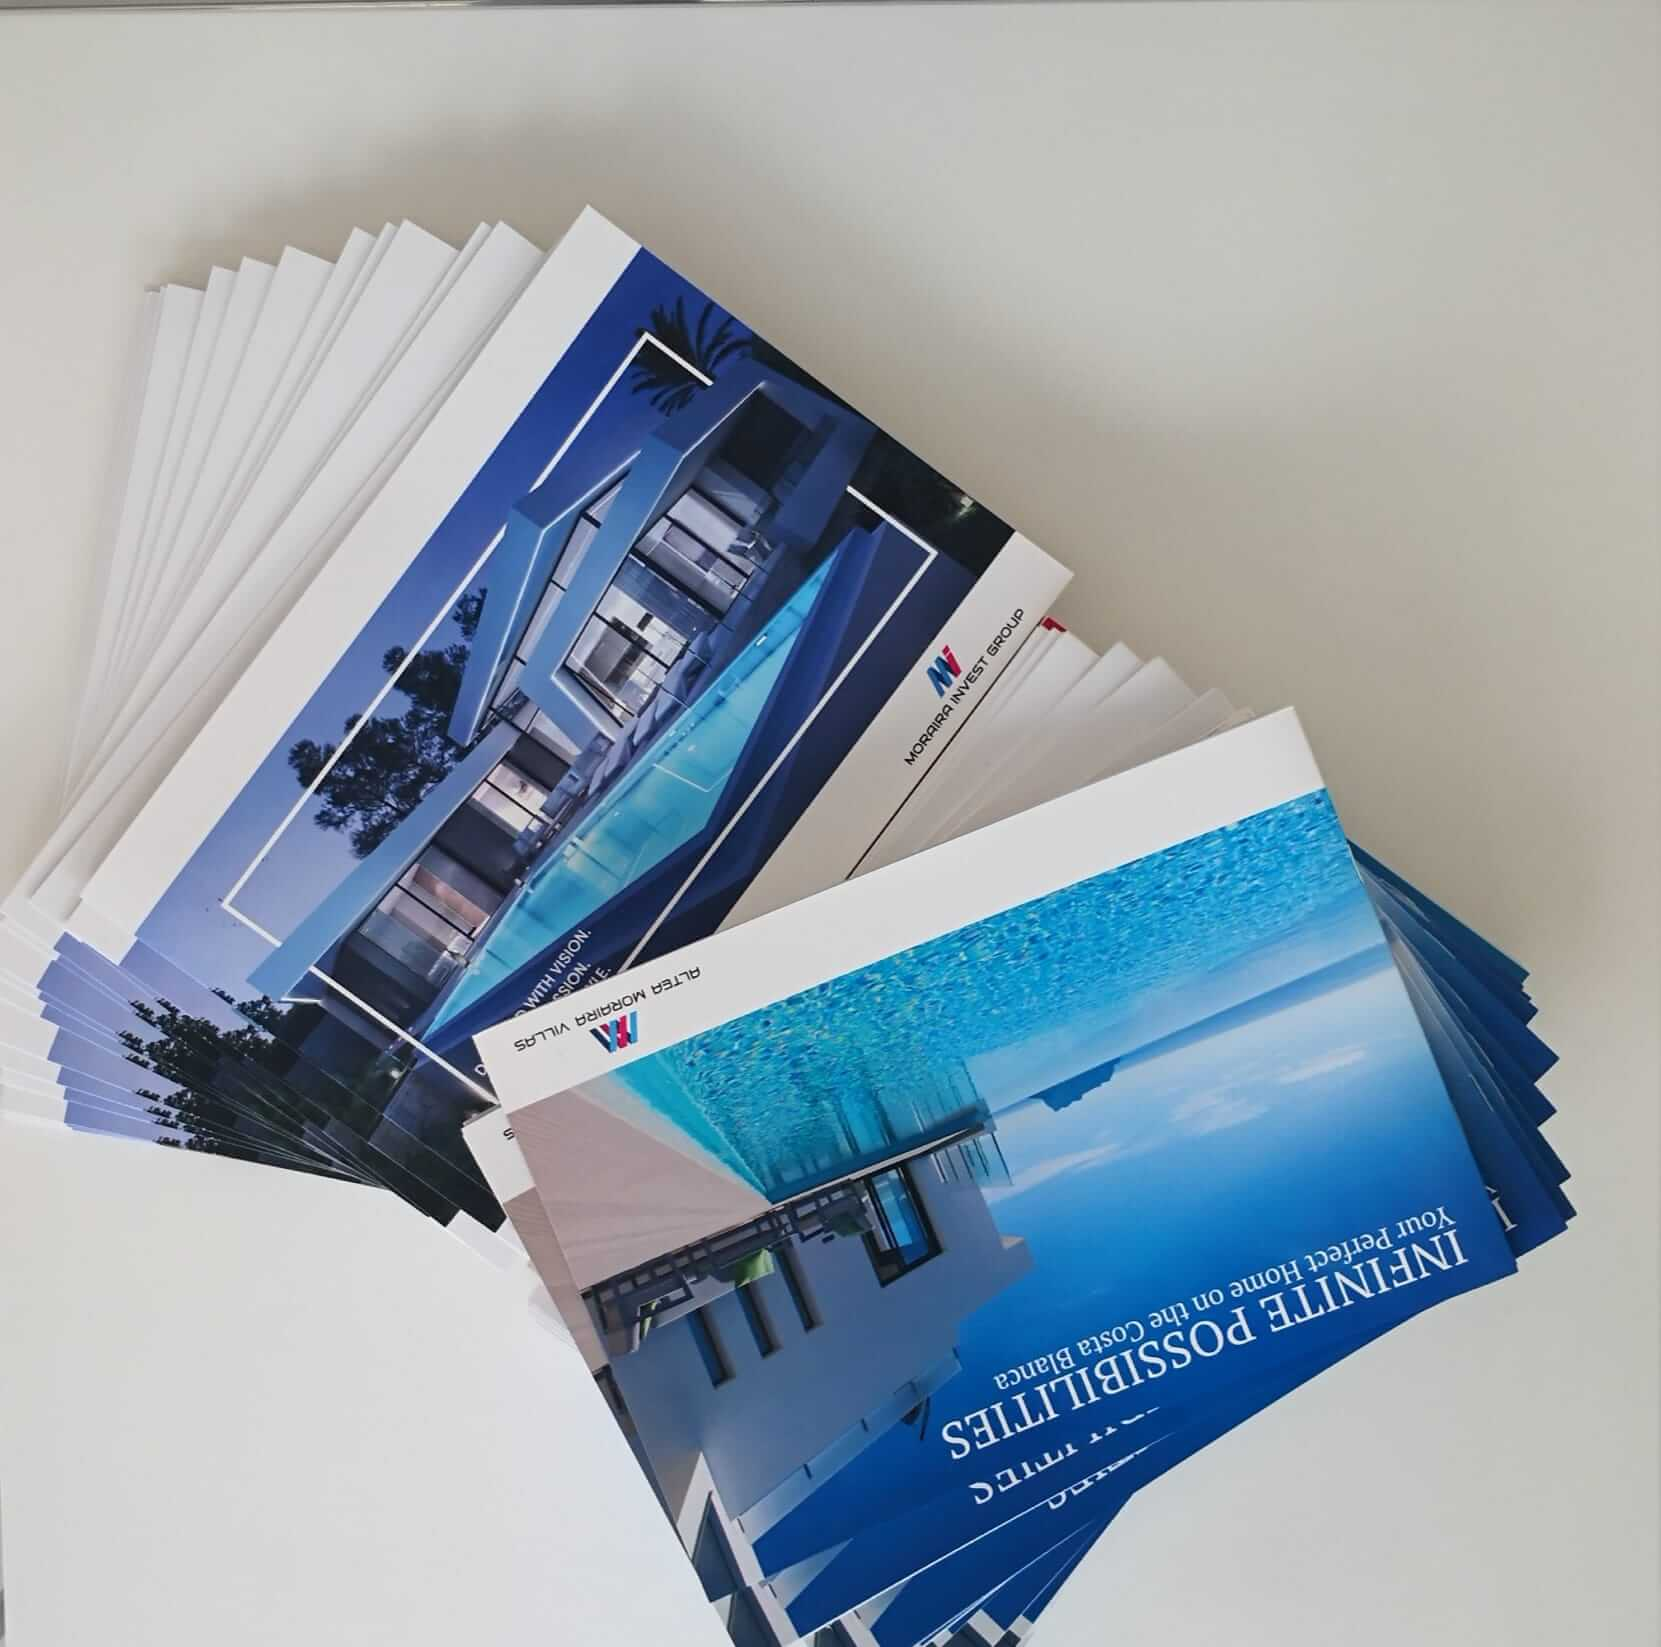 Digitale Brochure foto altea moraira villas makelaars in altea